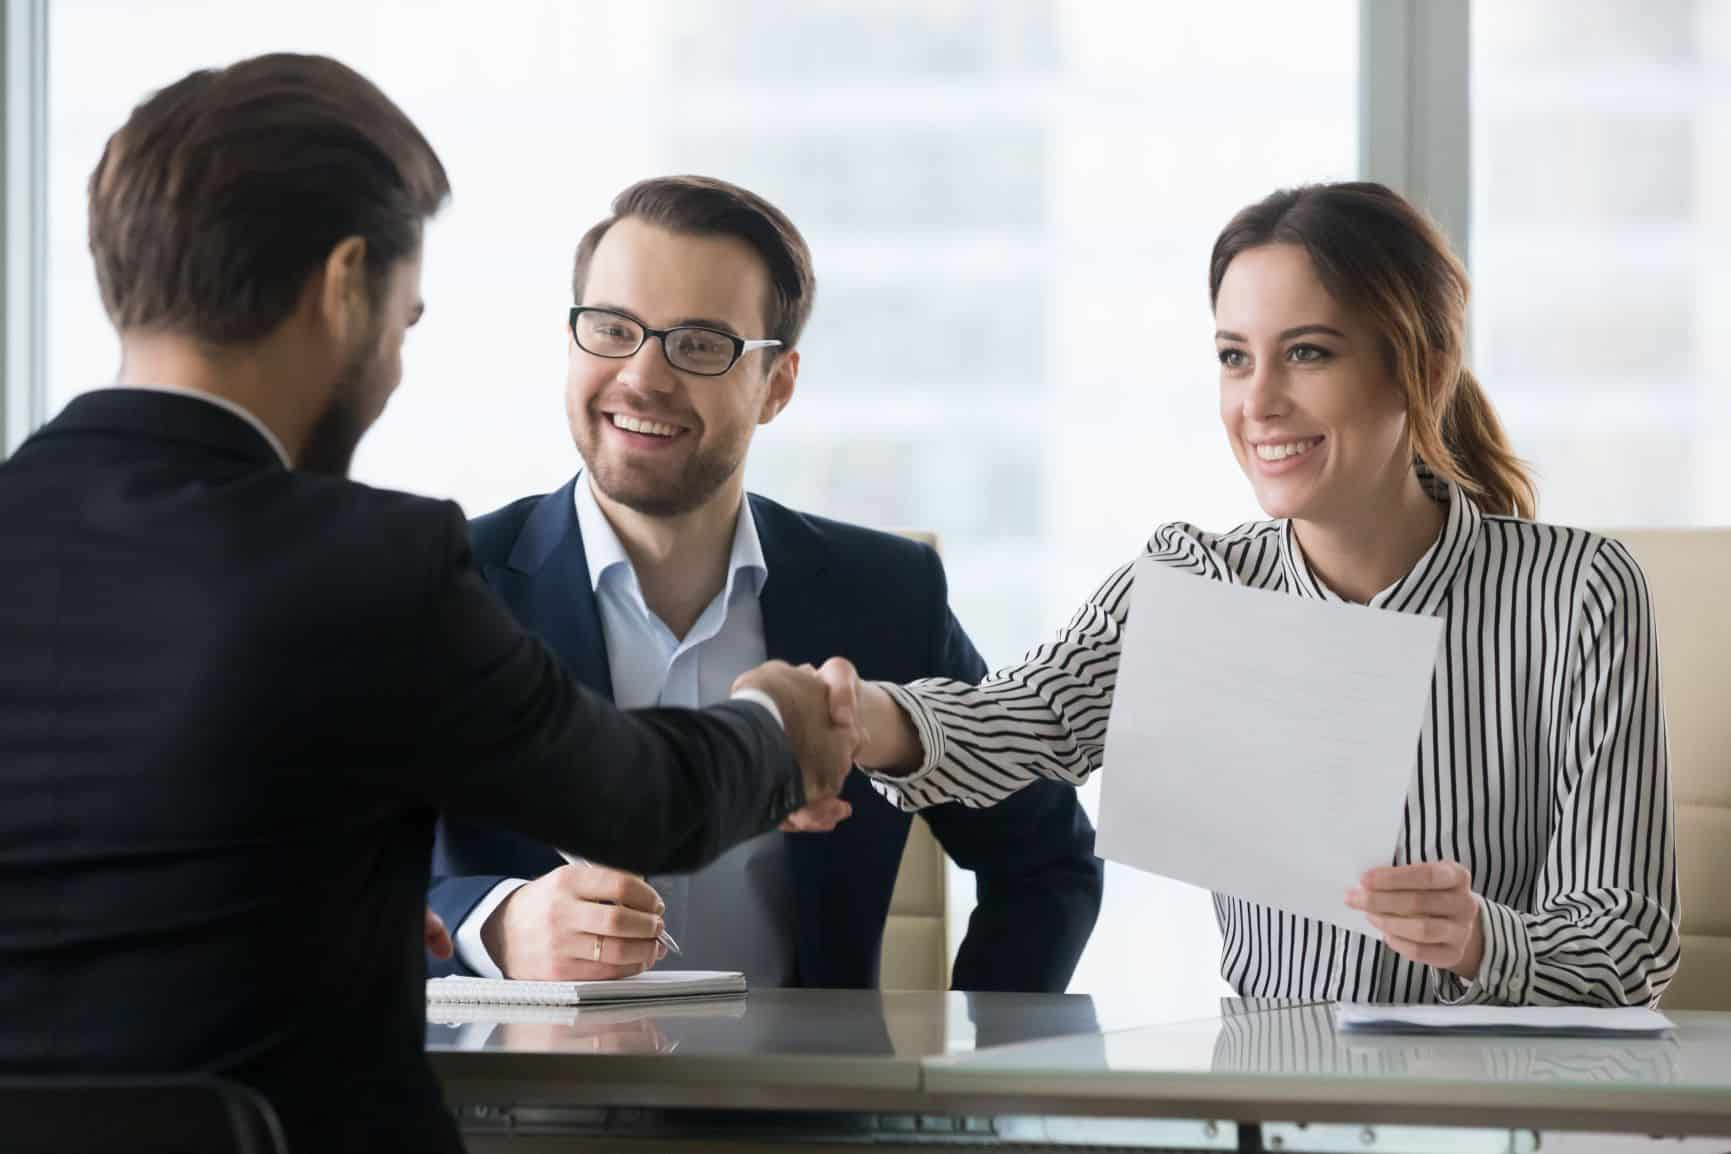 stretnutie a podanie ruky